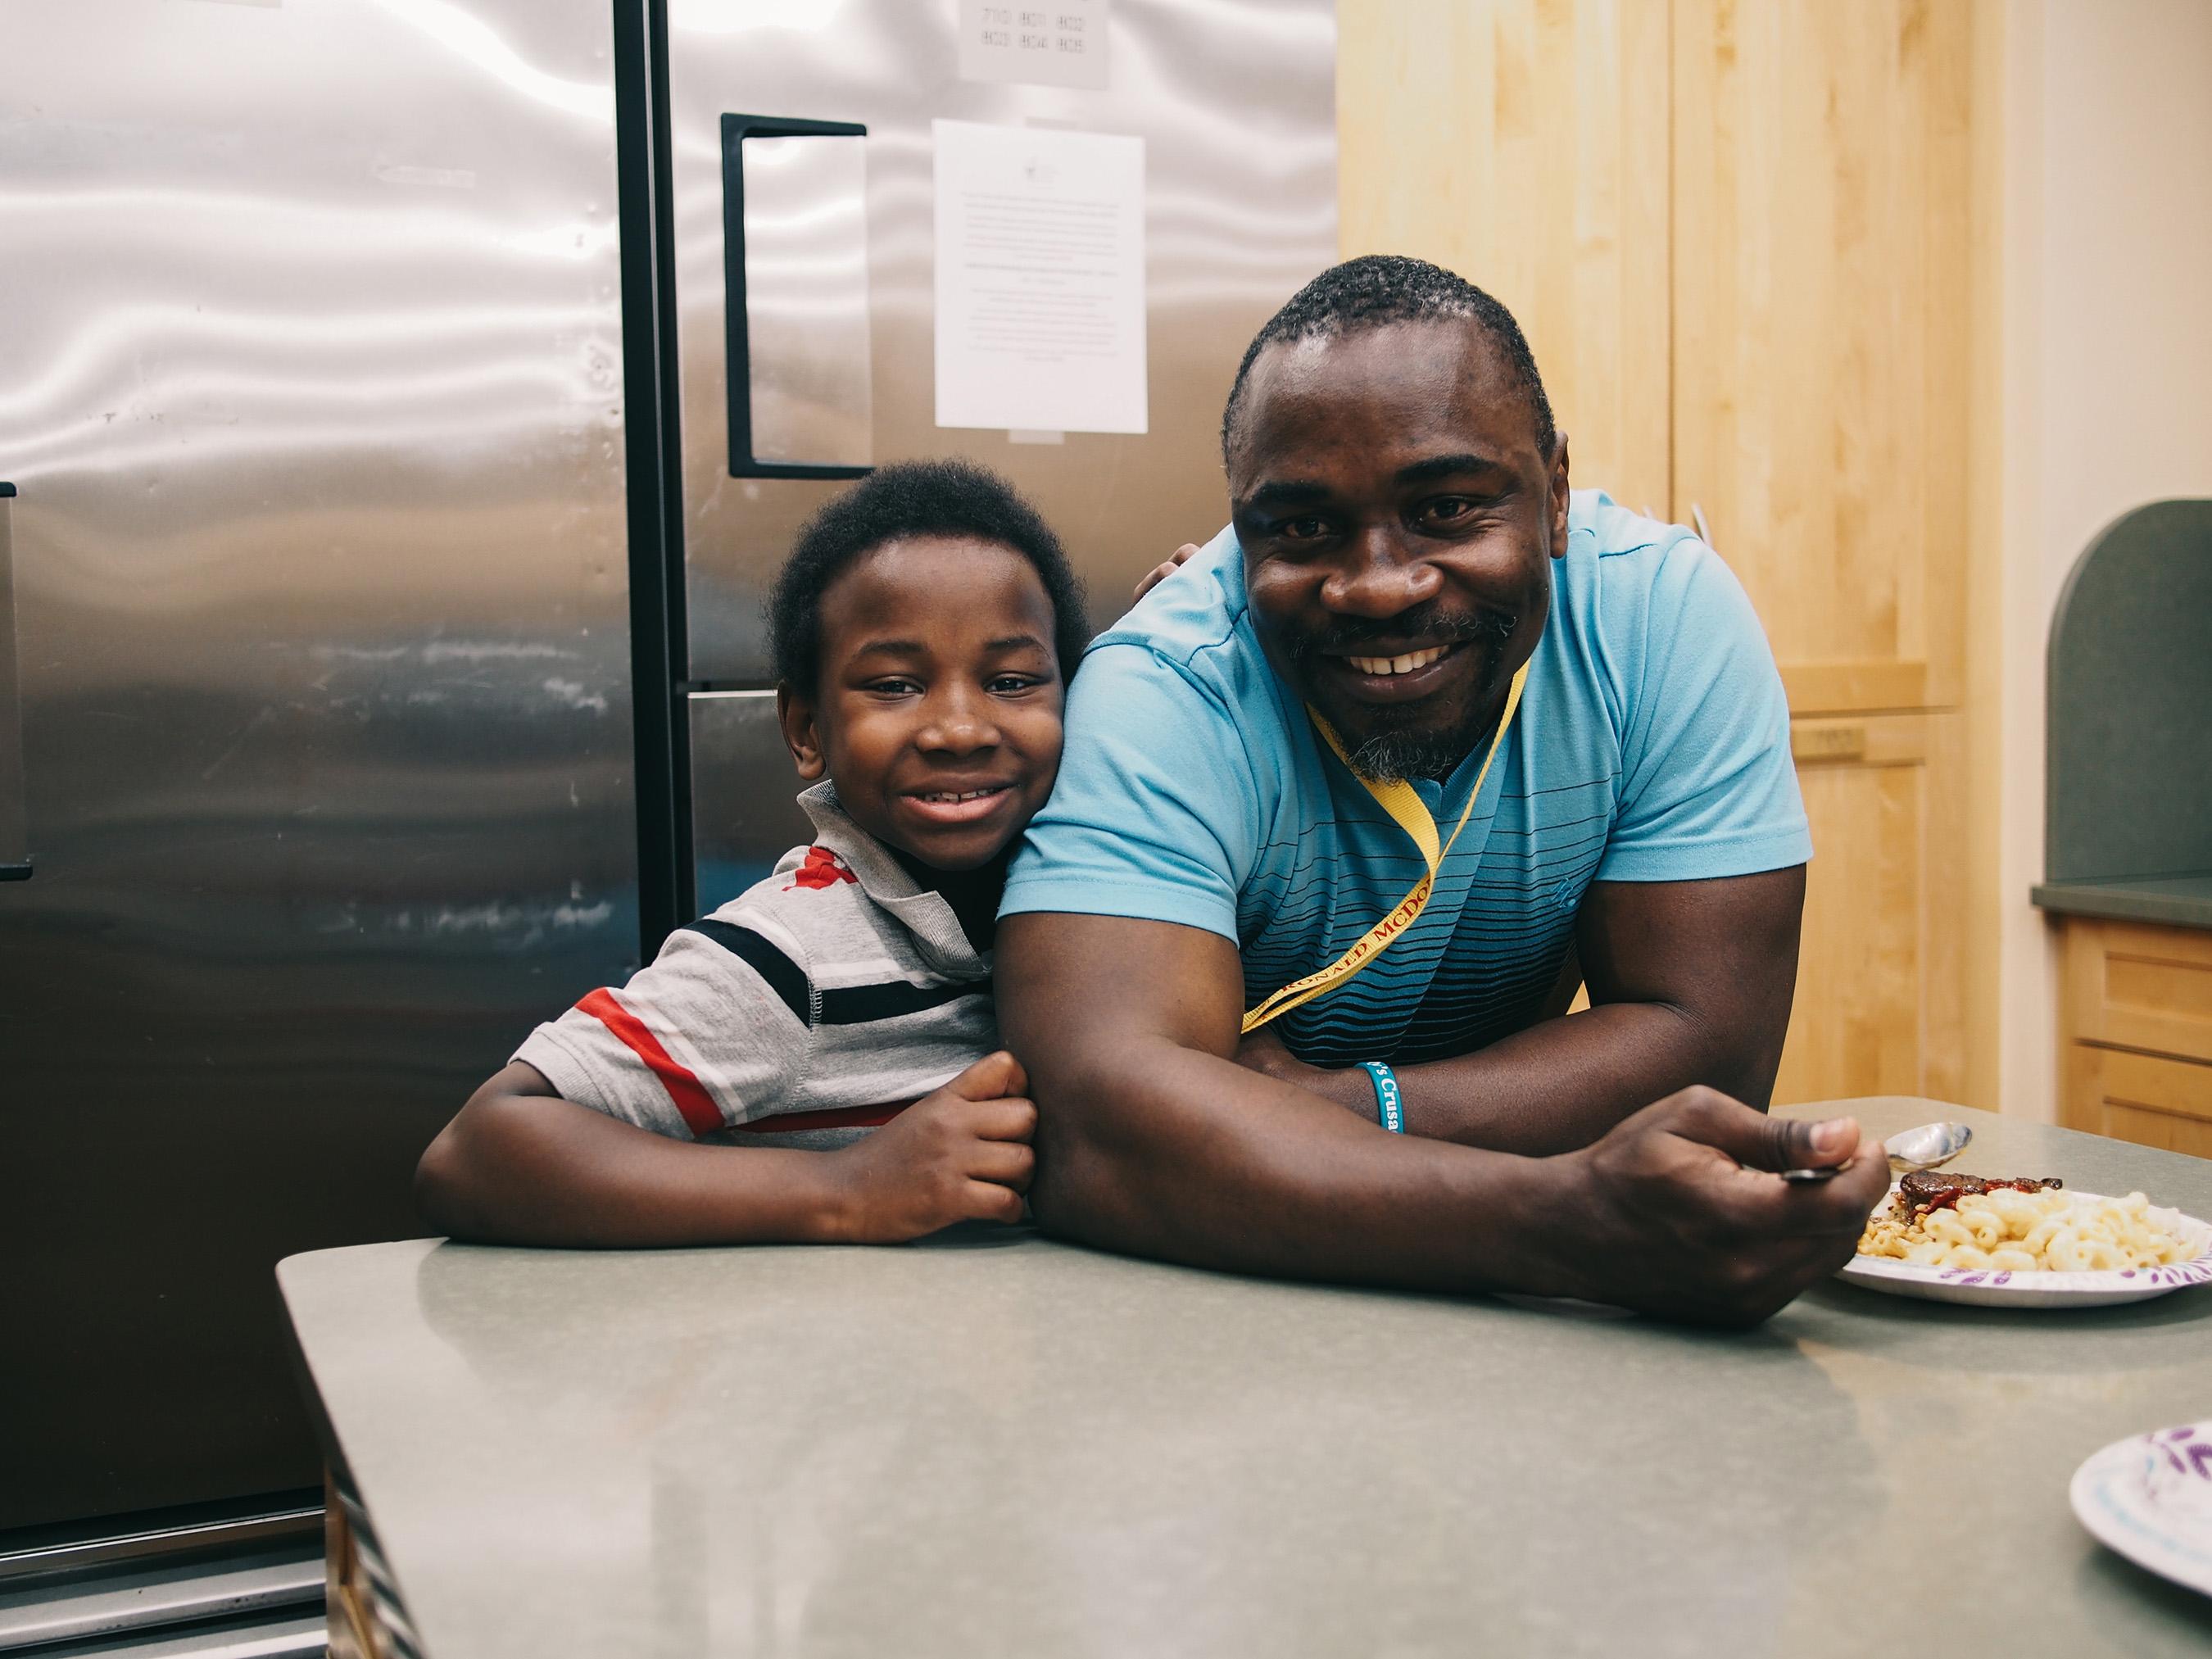 Ronald McDonald House® New York is keeping families close.